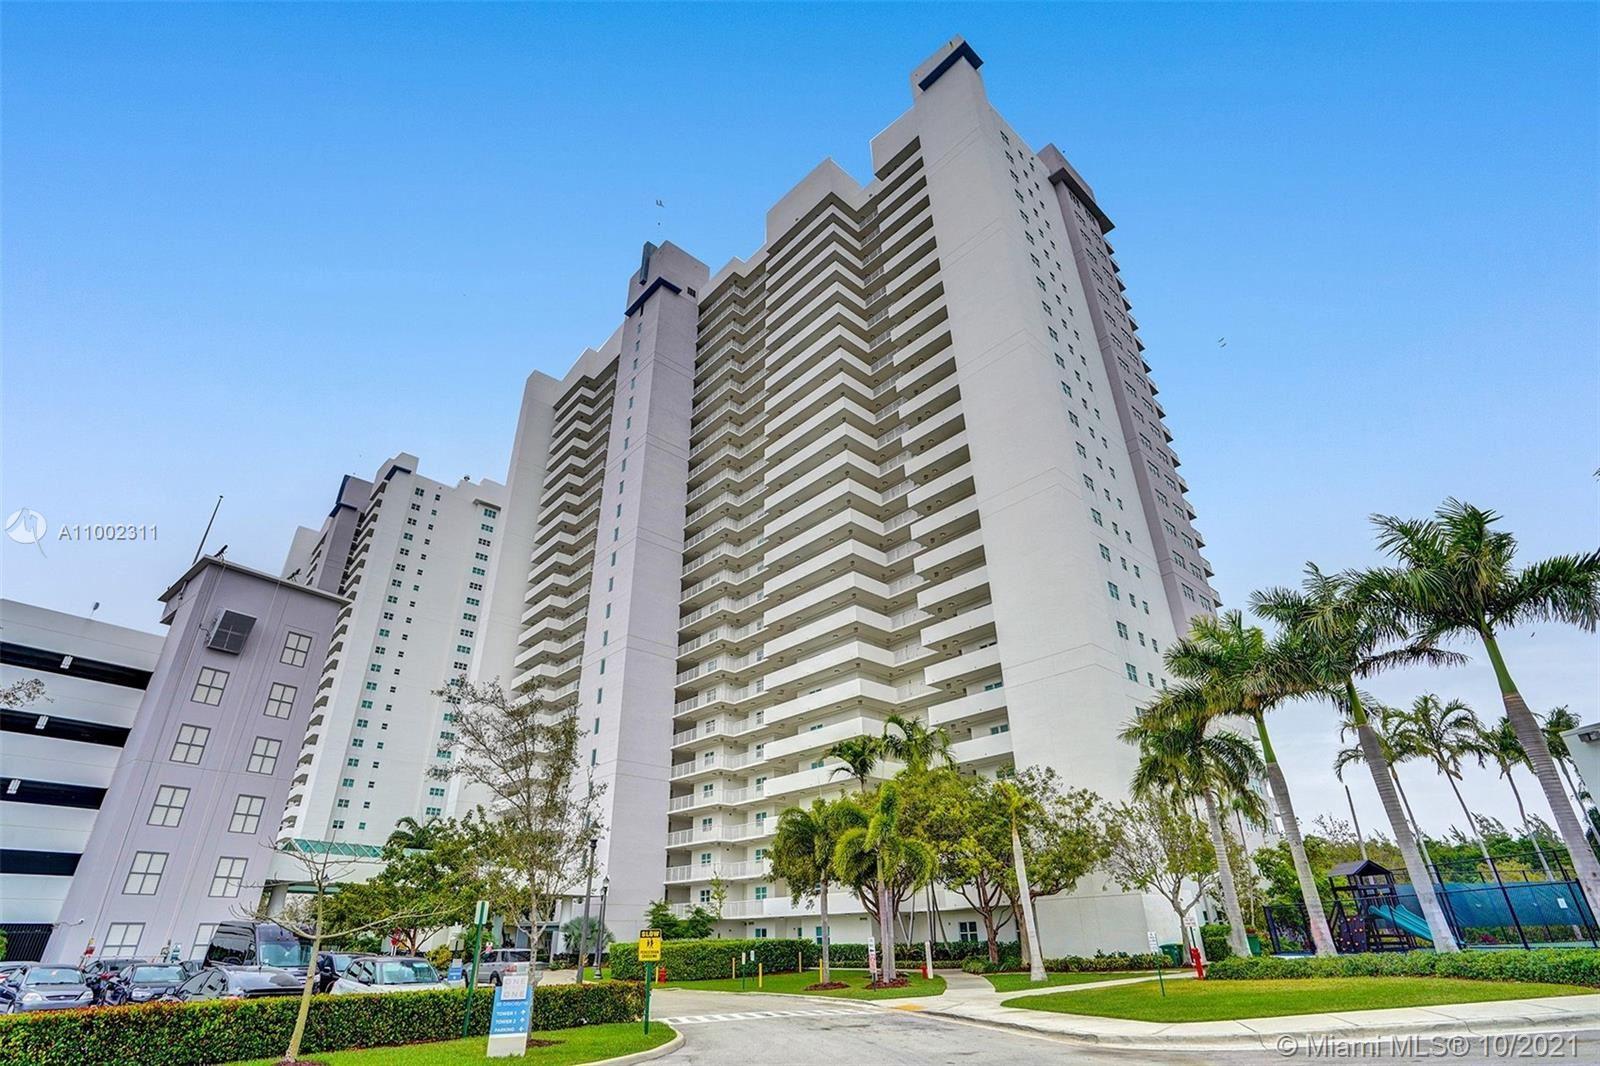 Photo of 14951 Royal Oaks Ln #2303, North Miami, FL 33181 (MLS # A11002311)